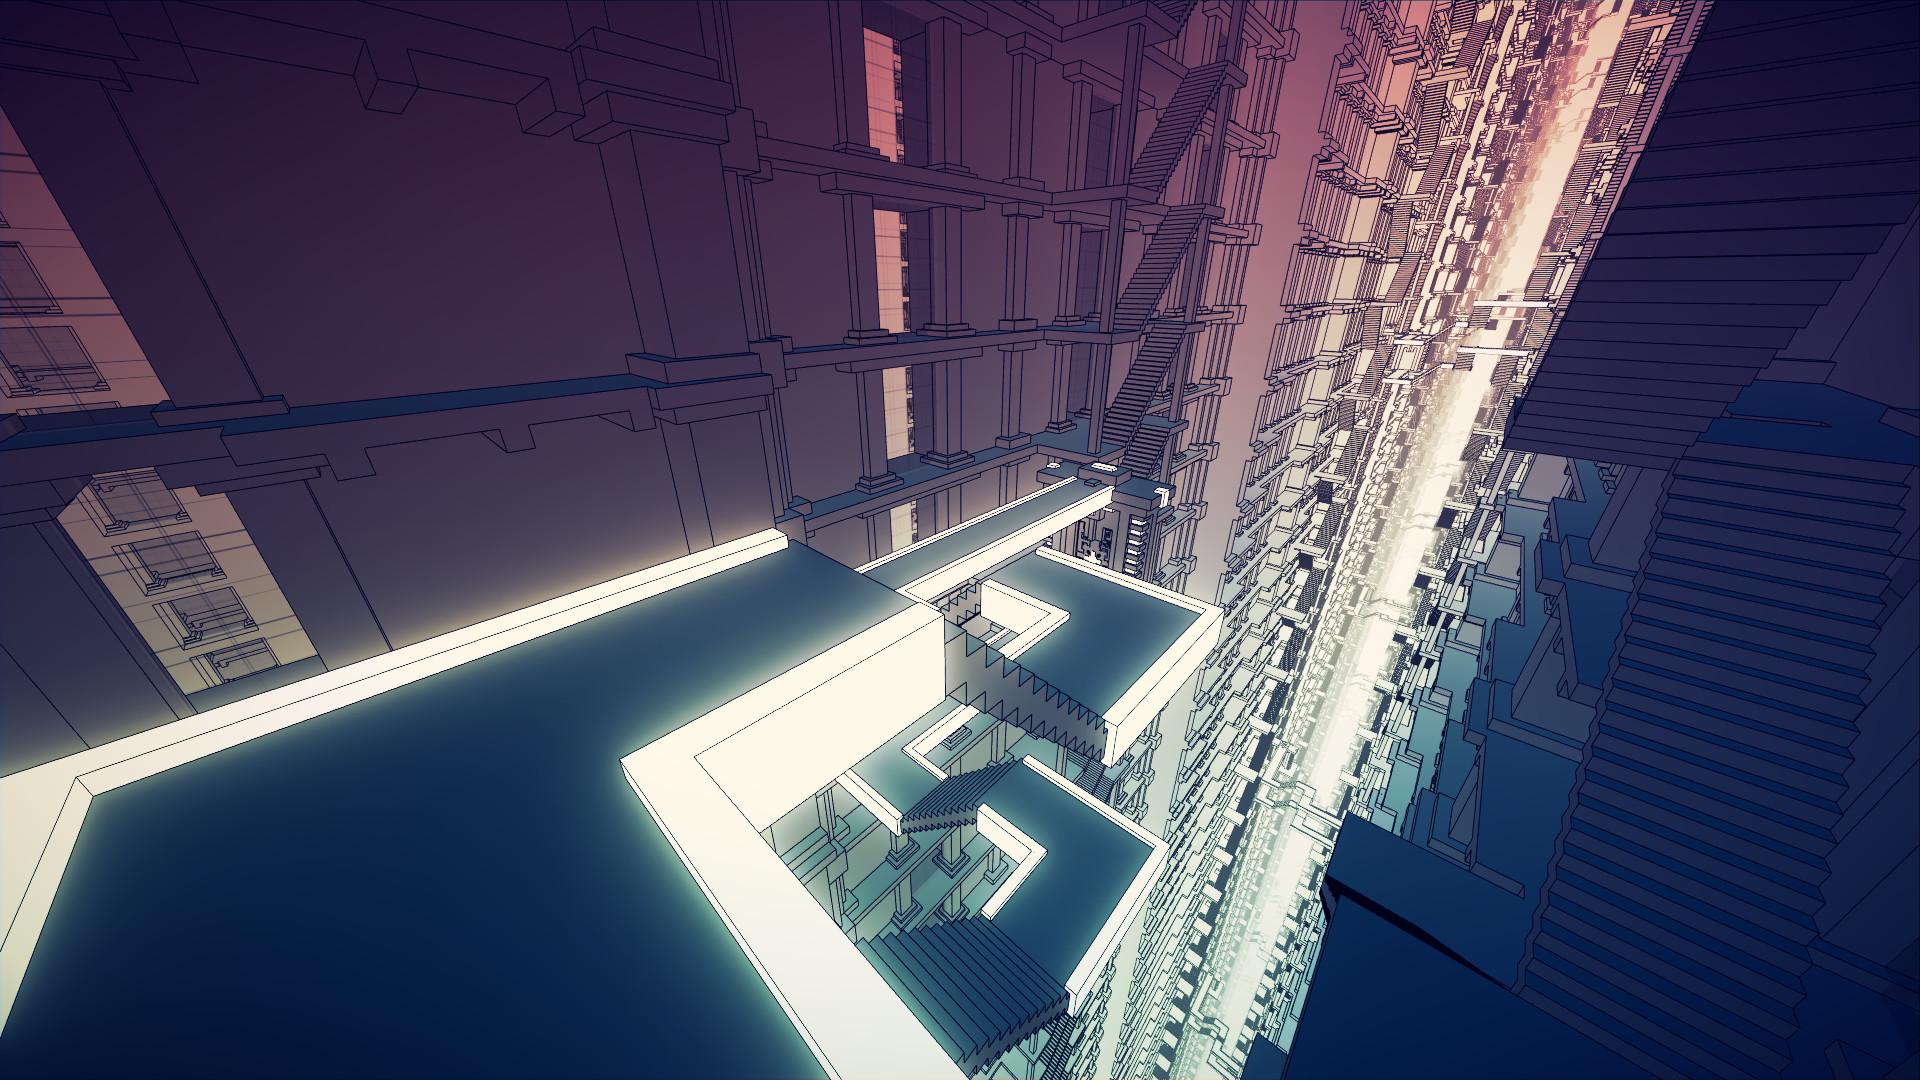 manifold-garden-pc-screenshot-03